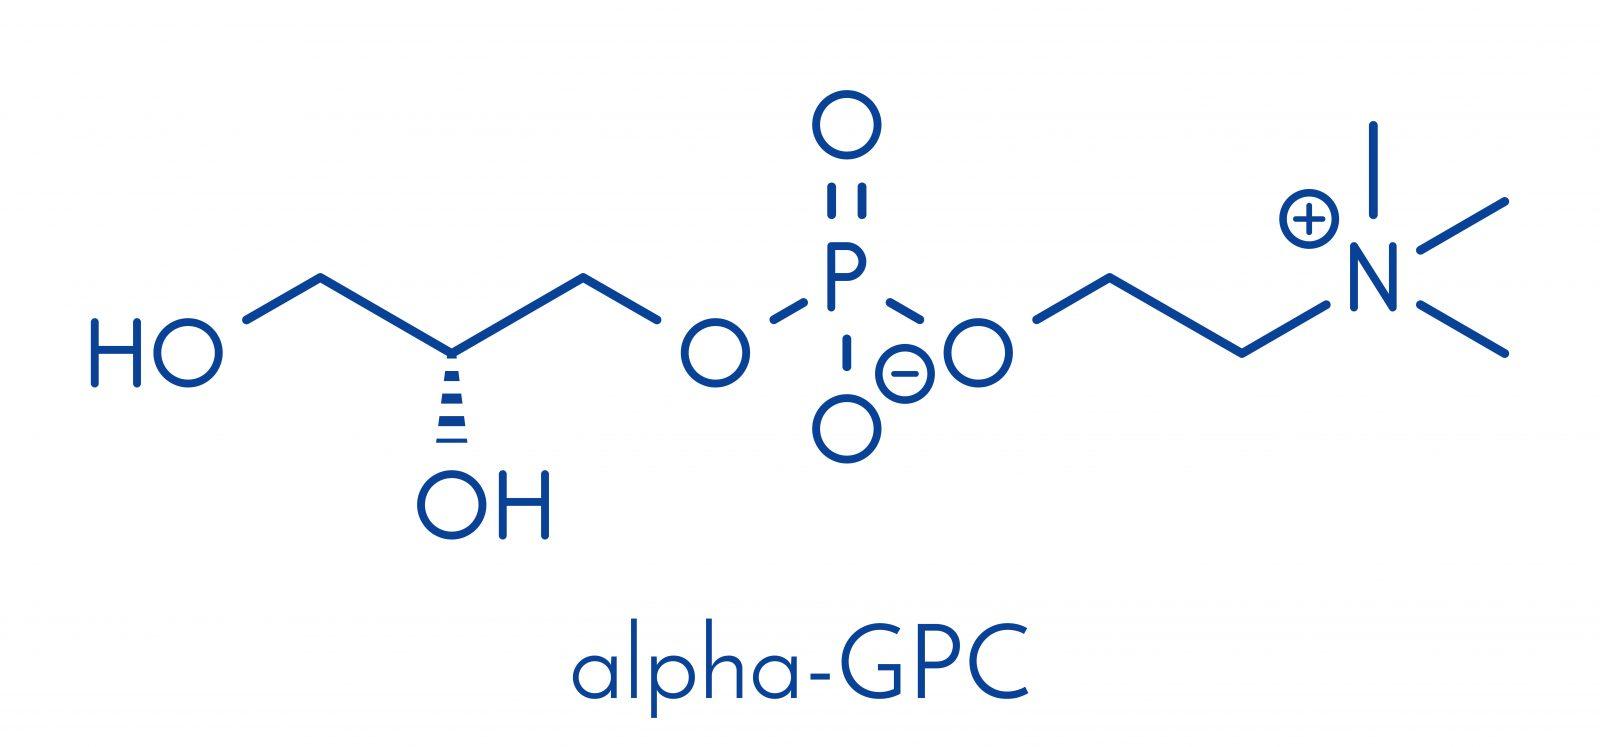 Alpha GPC Struckture